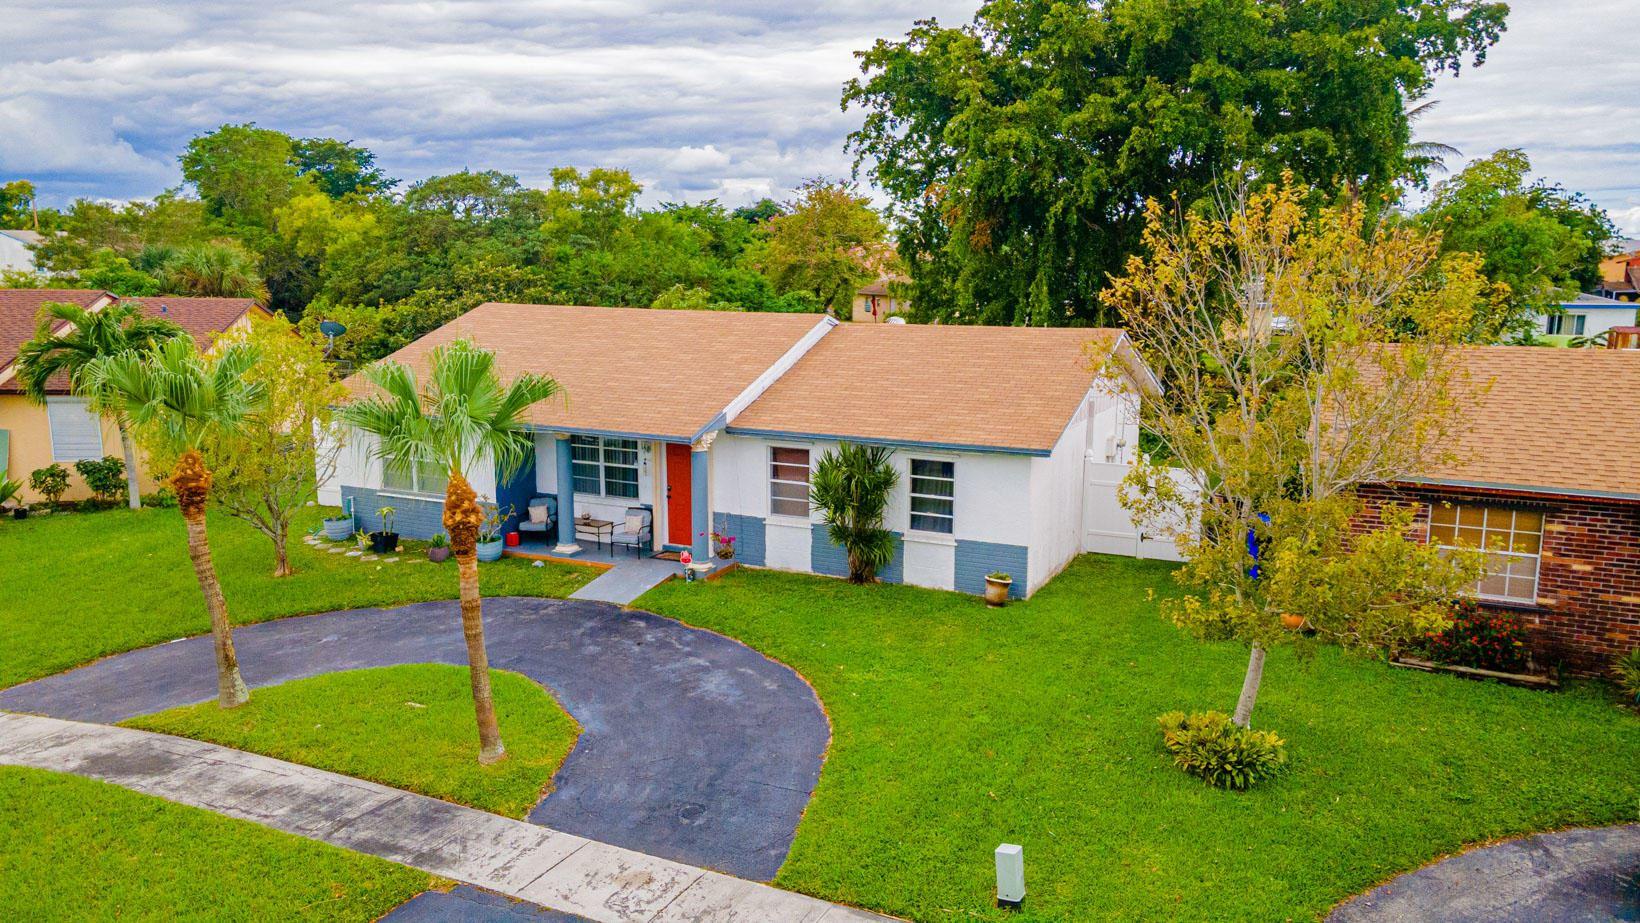 Photo of 707 SW 79 Avenue, North Lauderdale, FL 33068 (MLS # RX-10671151)